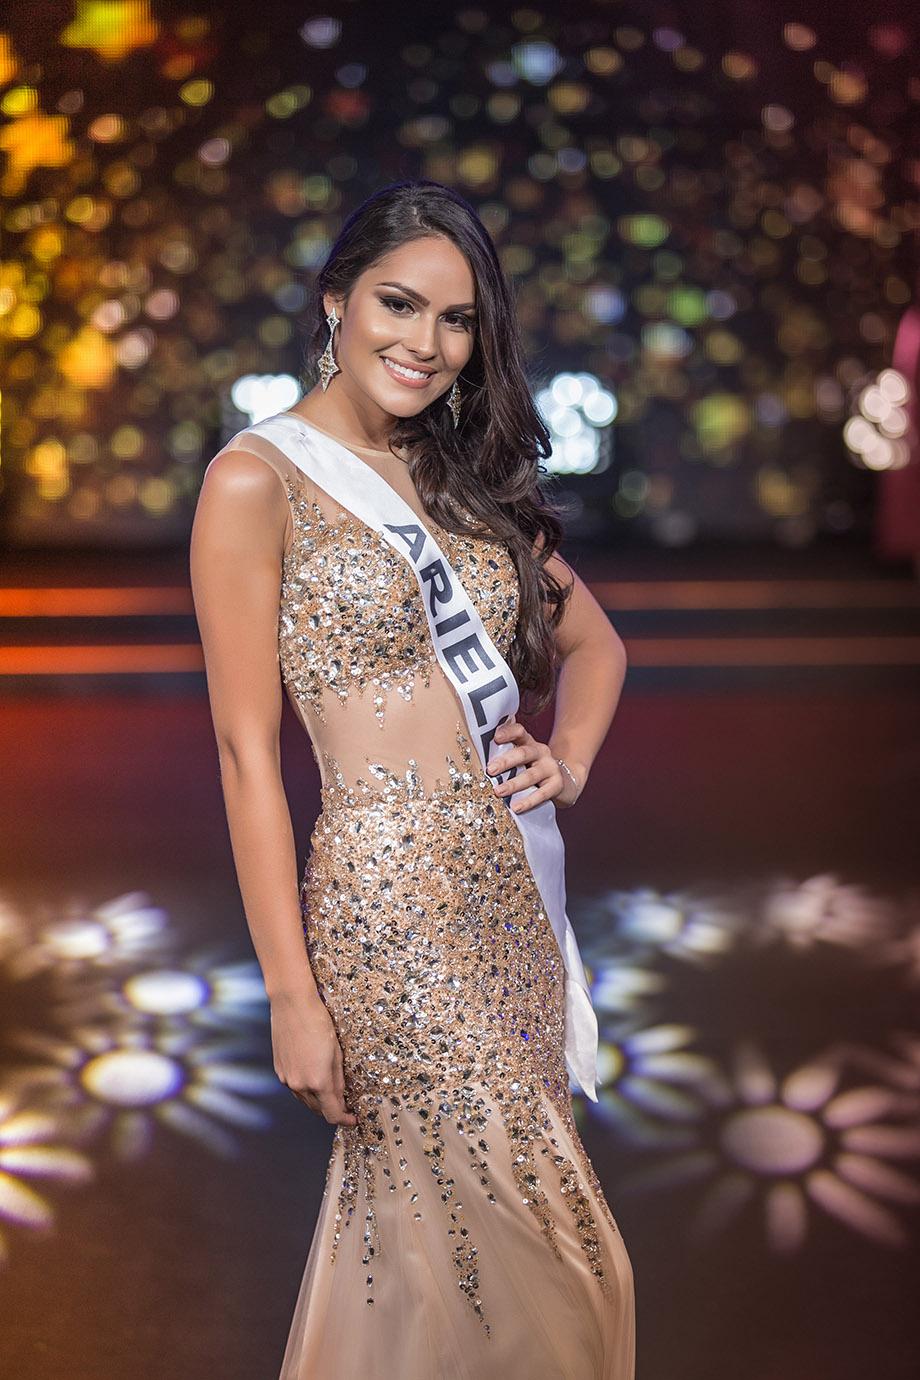 Blog Cris Moreira - Miss Fortaleza 2016 - 23